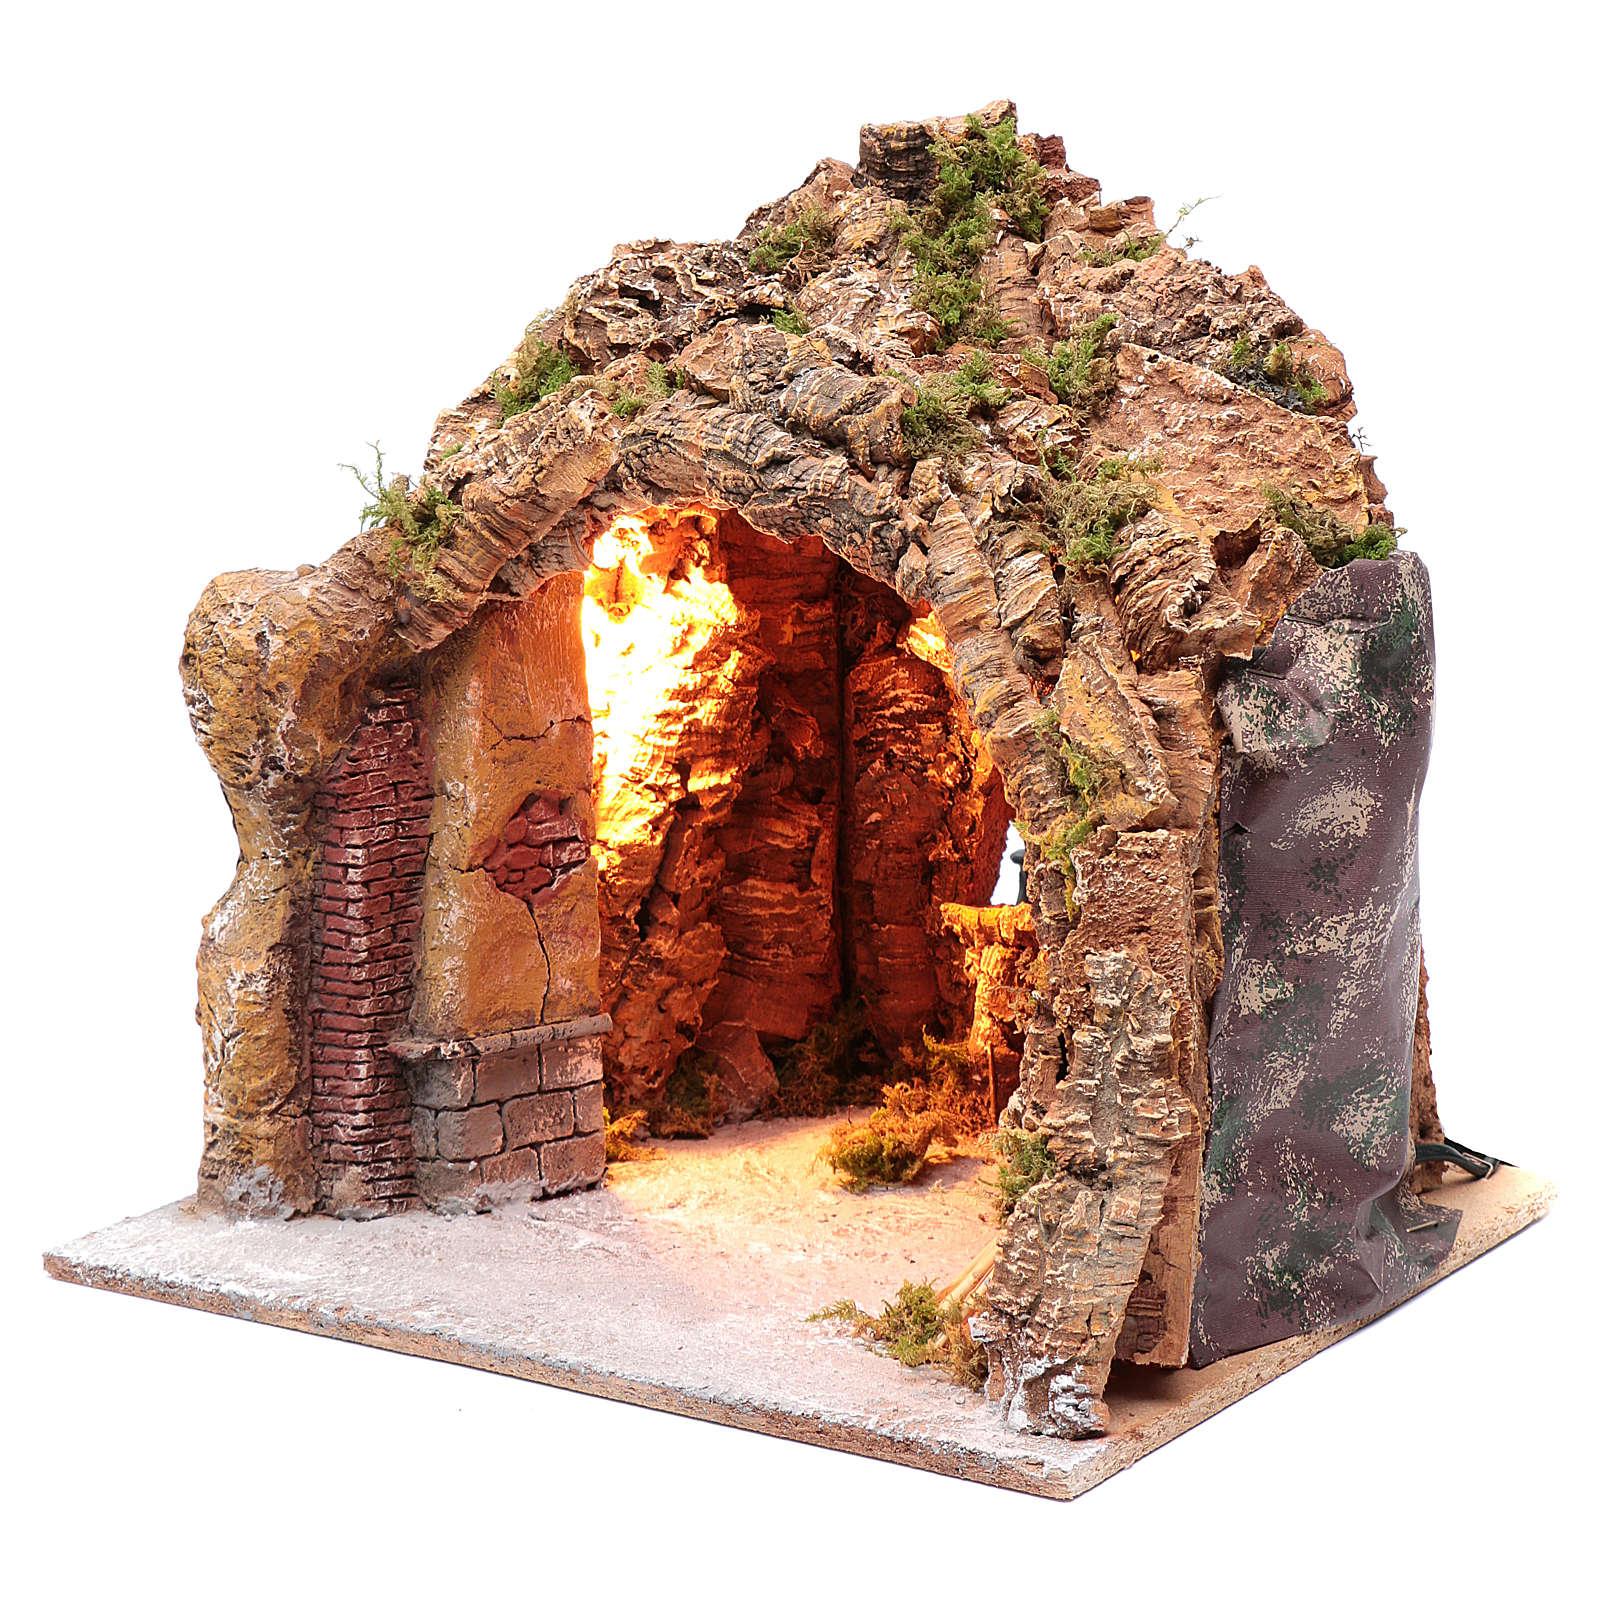 Gruta presépio Nápoles iluminada e efeito fogo 35x40x22 cm 4